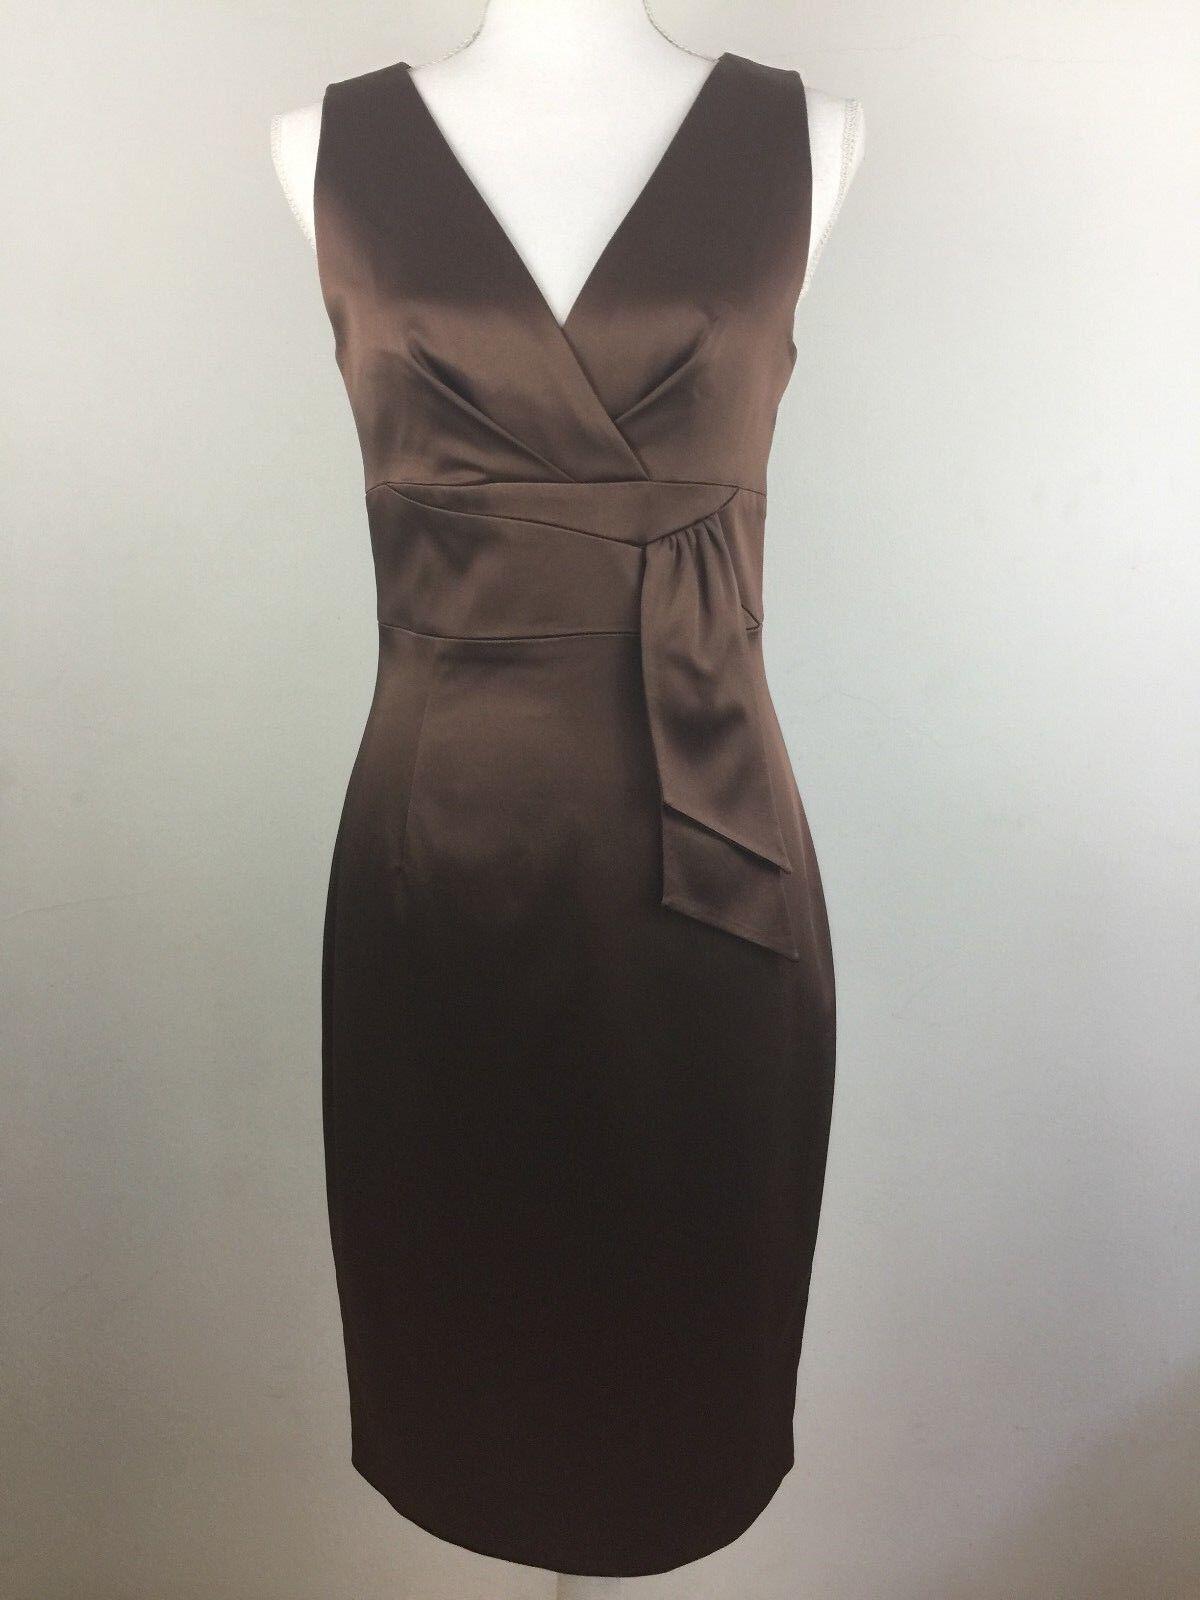 Kay Unger New York Woman''s braun Dress, Größe 8